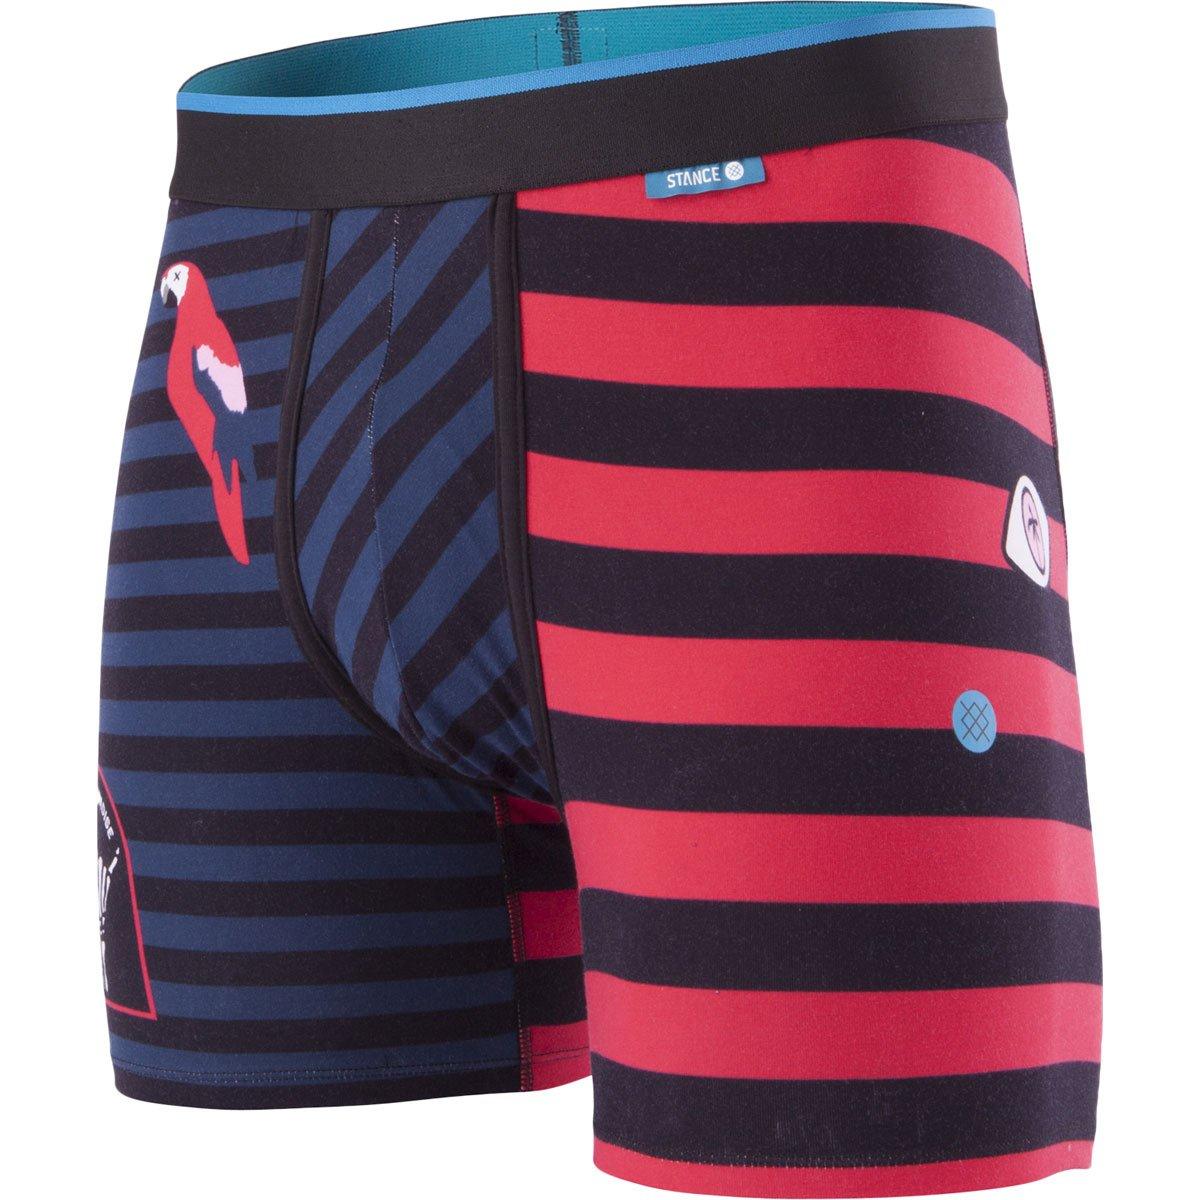 Stance Men's Travel Vibes Underwear,Large,Blue